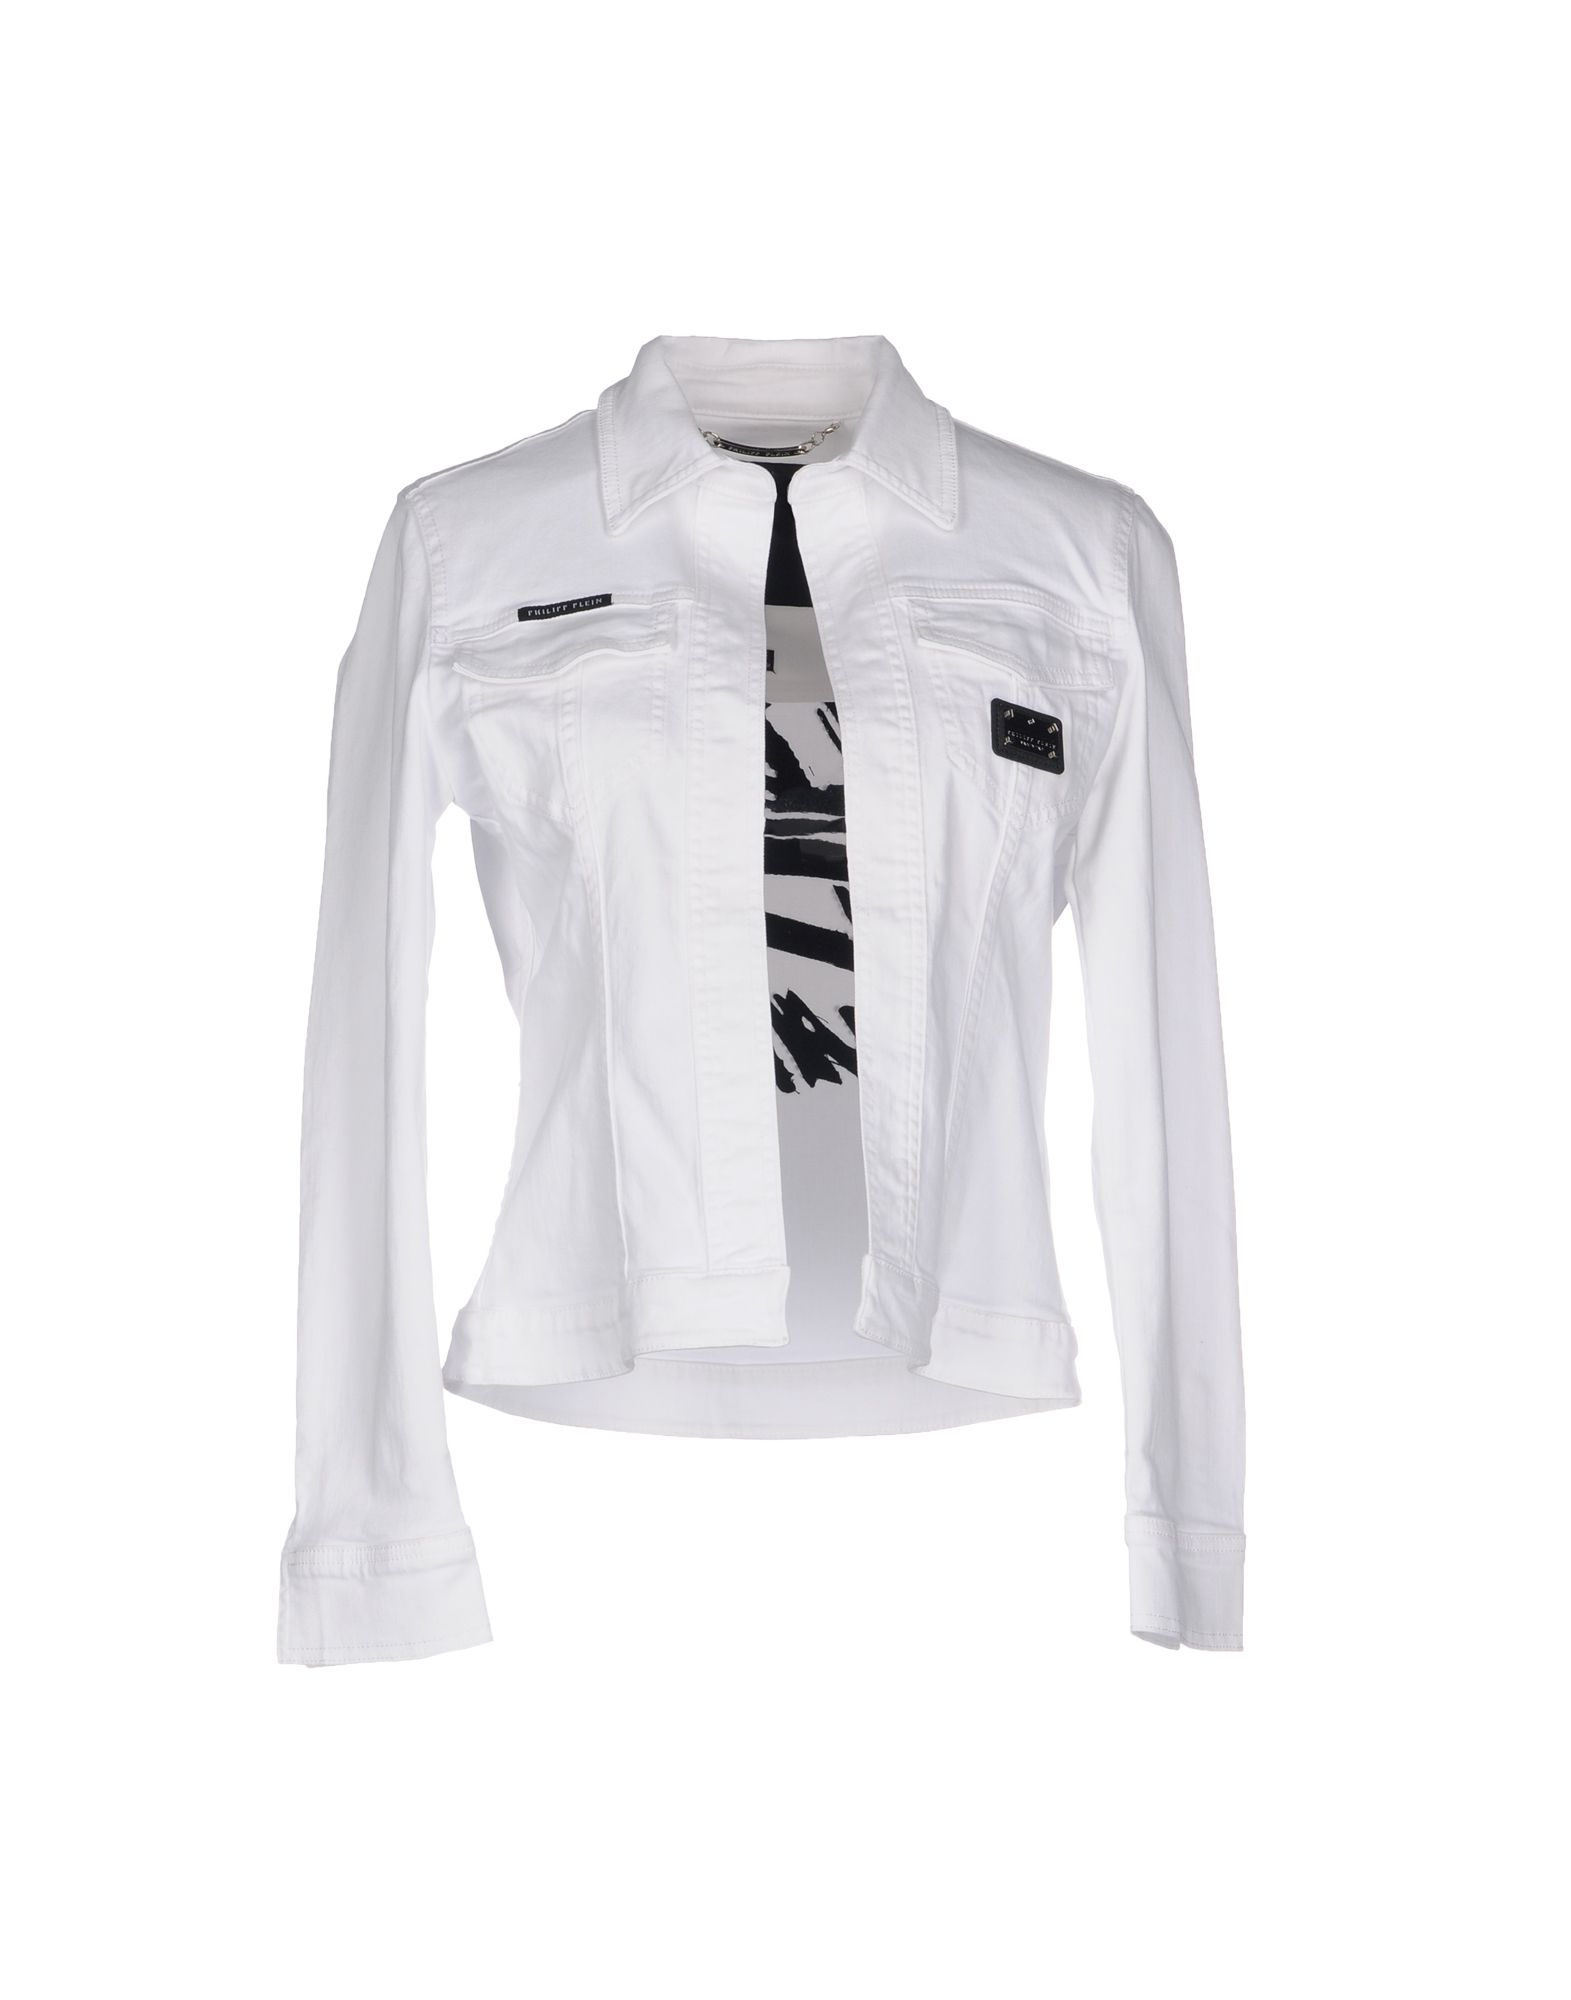 PHILIPP PLEIN Джинсовая верхняя одежда верхняя одежда